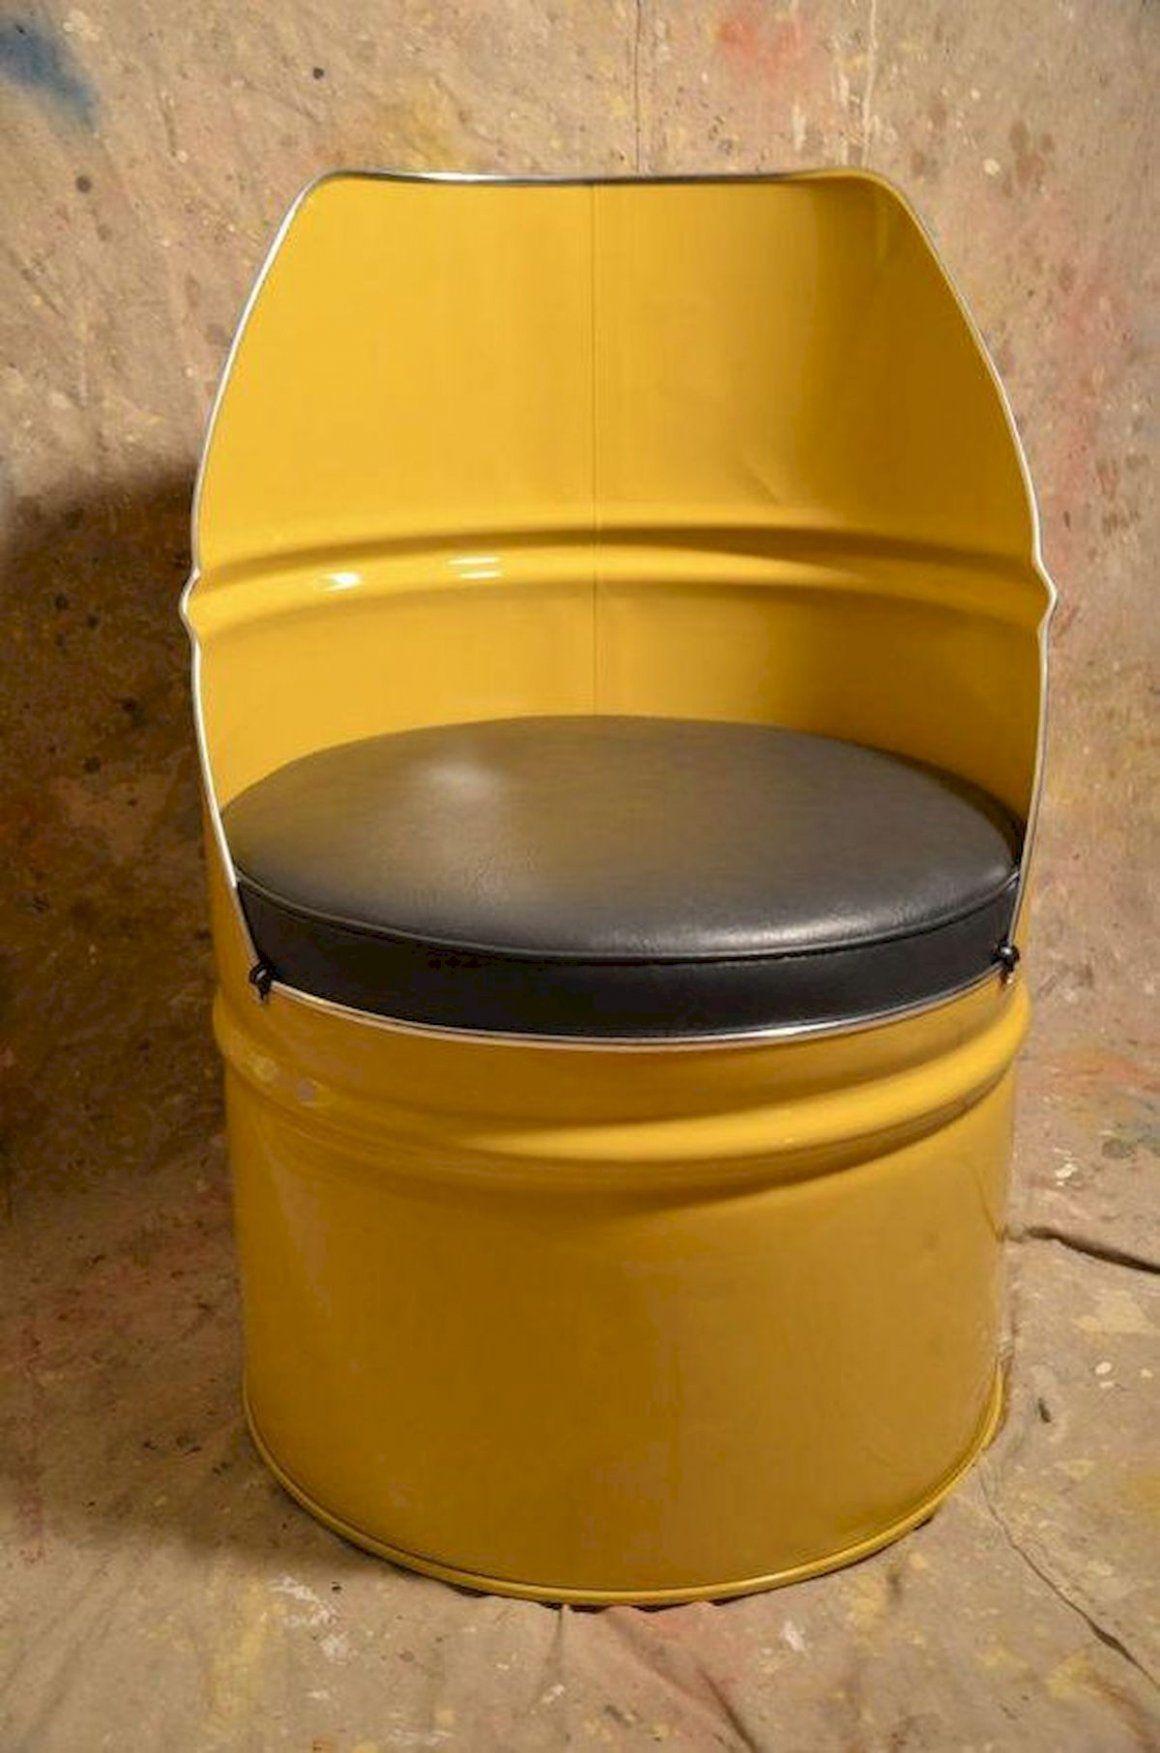 Barrel Metal Drum Project Ideas Engineering Discoveries In 2020 Barrel Chair Industrial Furniture Barrel Furniture